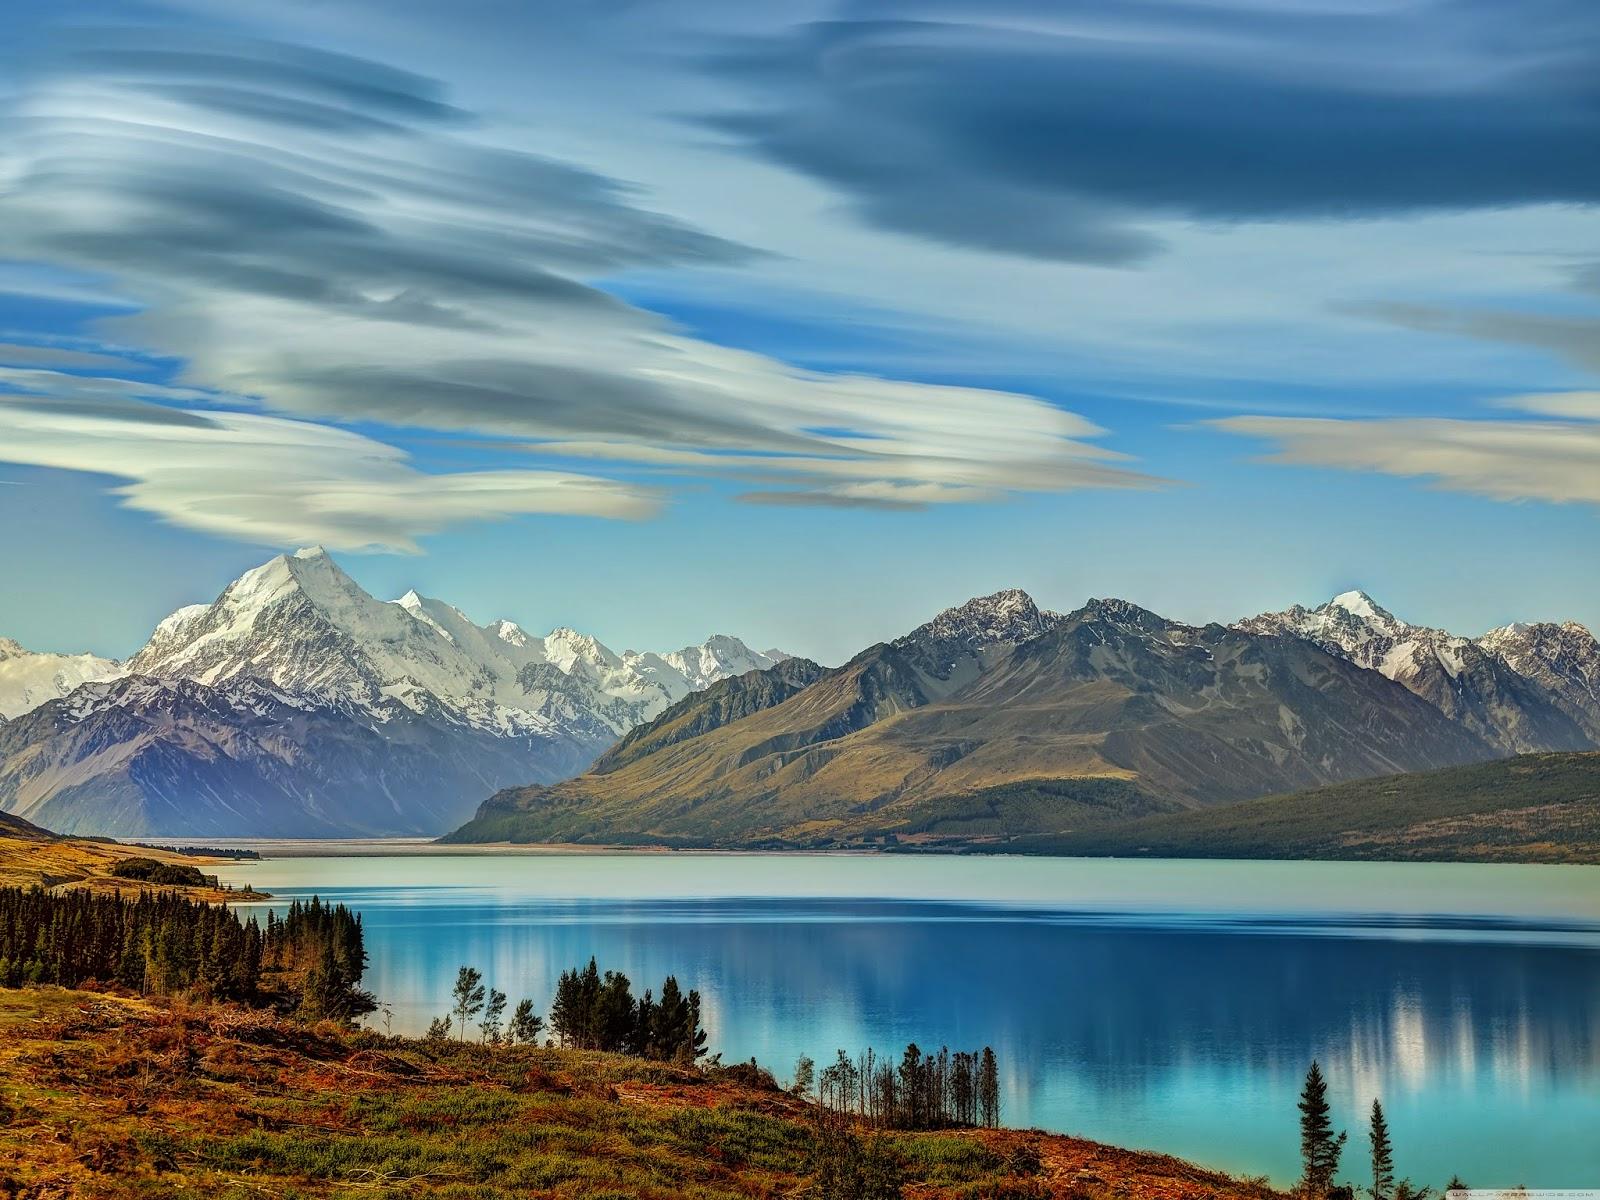 The Road to Mount Cook along Lake Pukaki Wallpaper